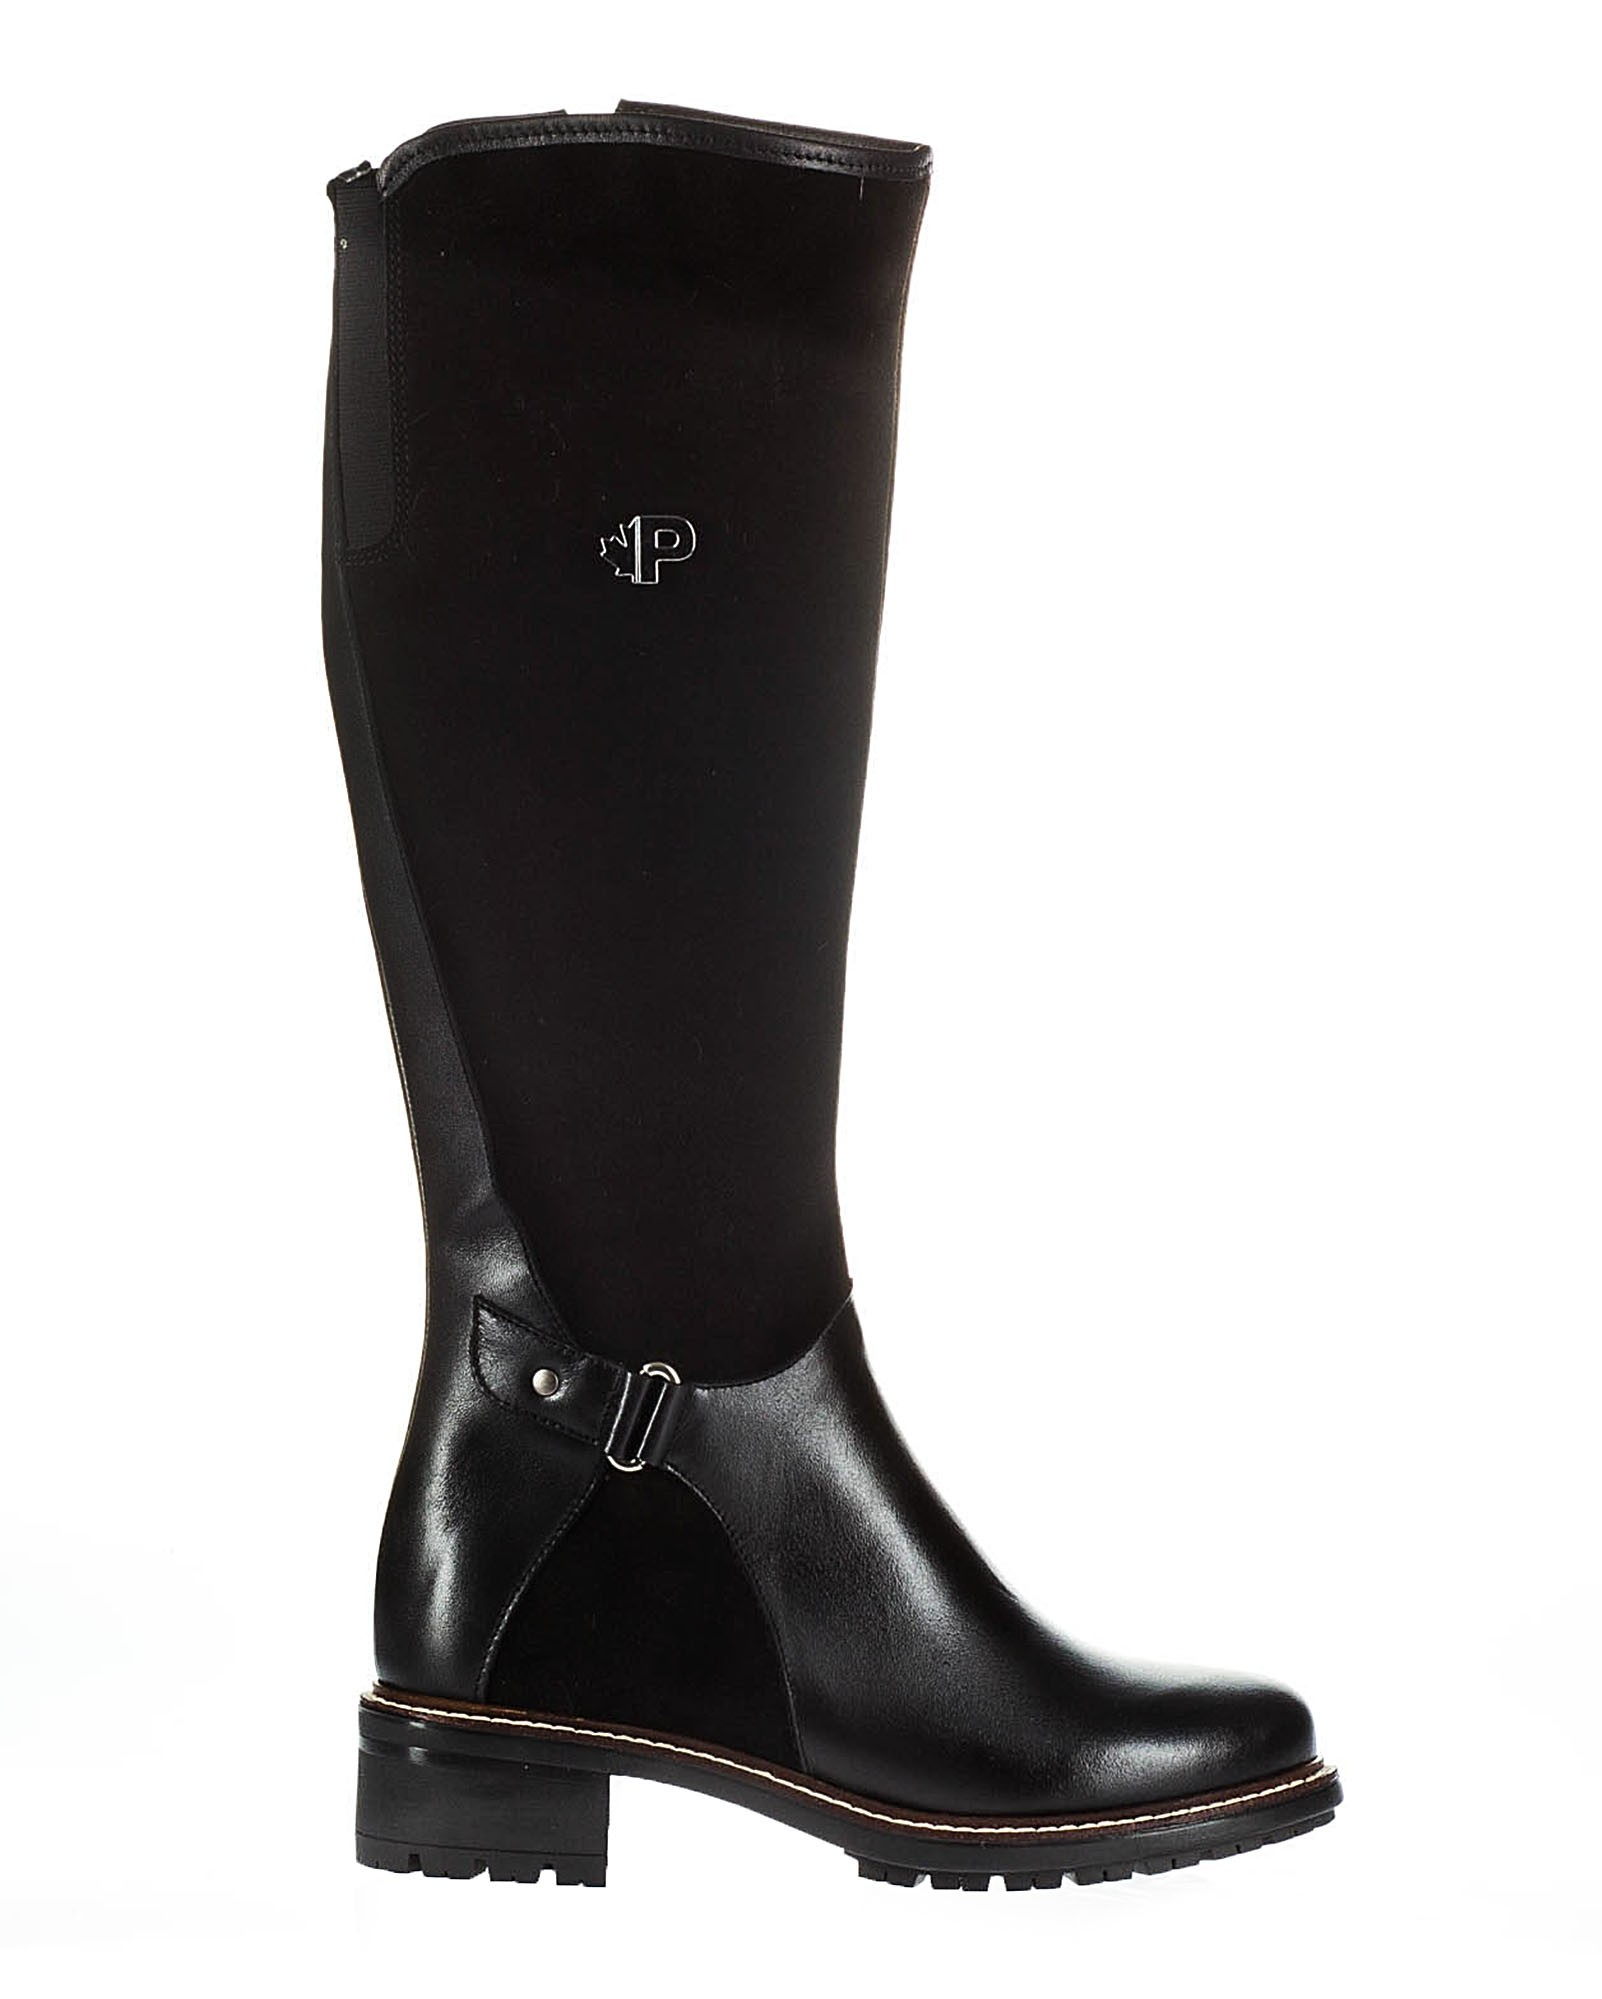 Pajar Boots carry-f KHXDJKF